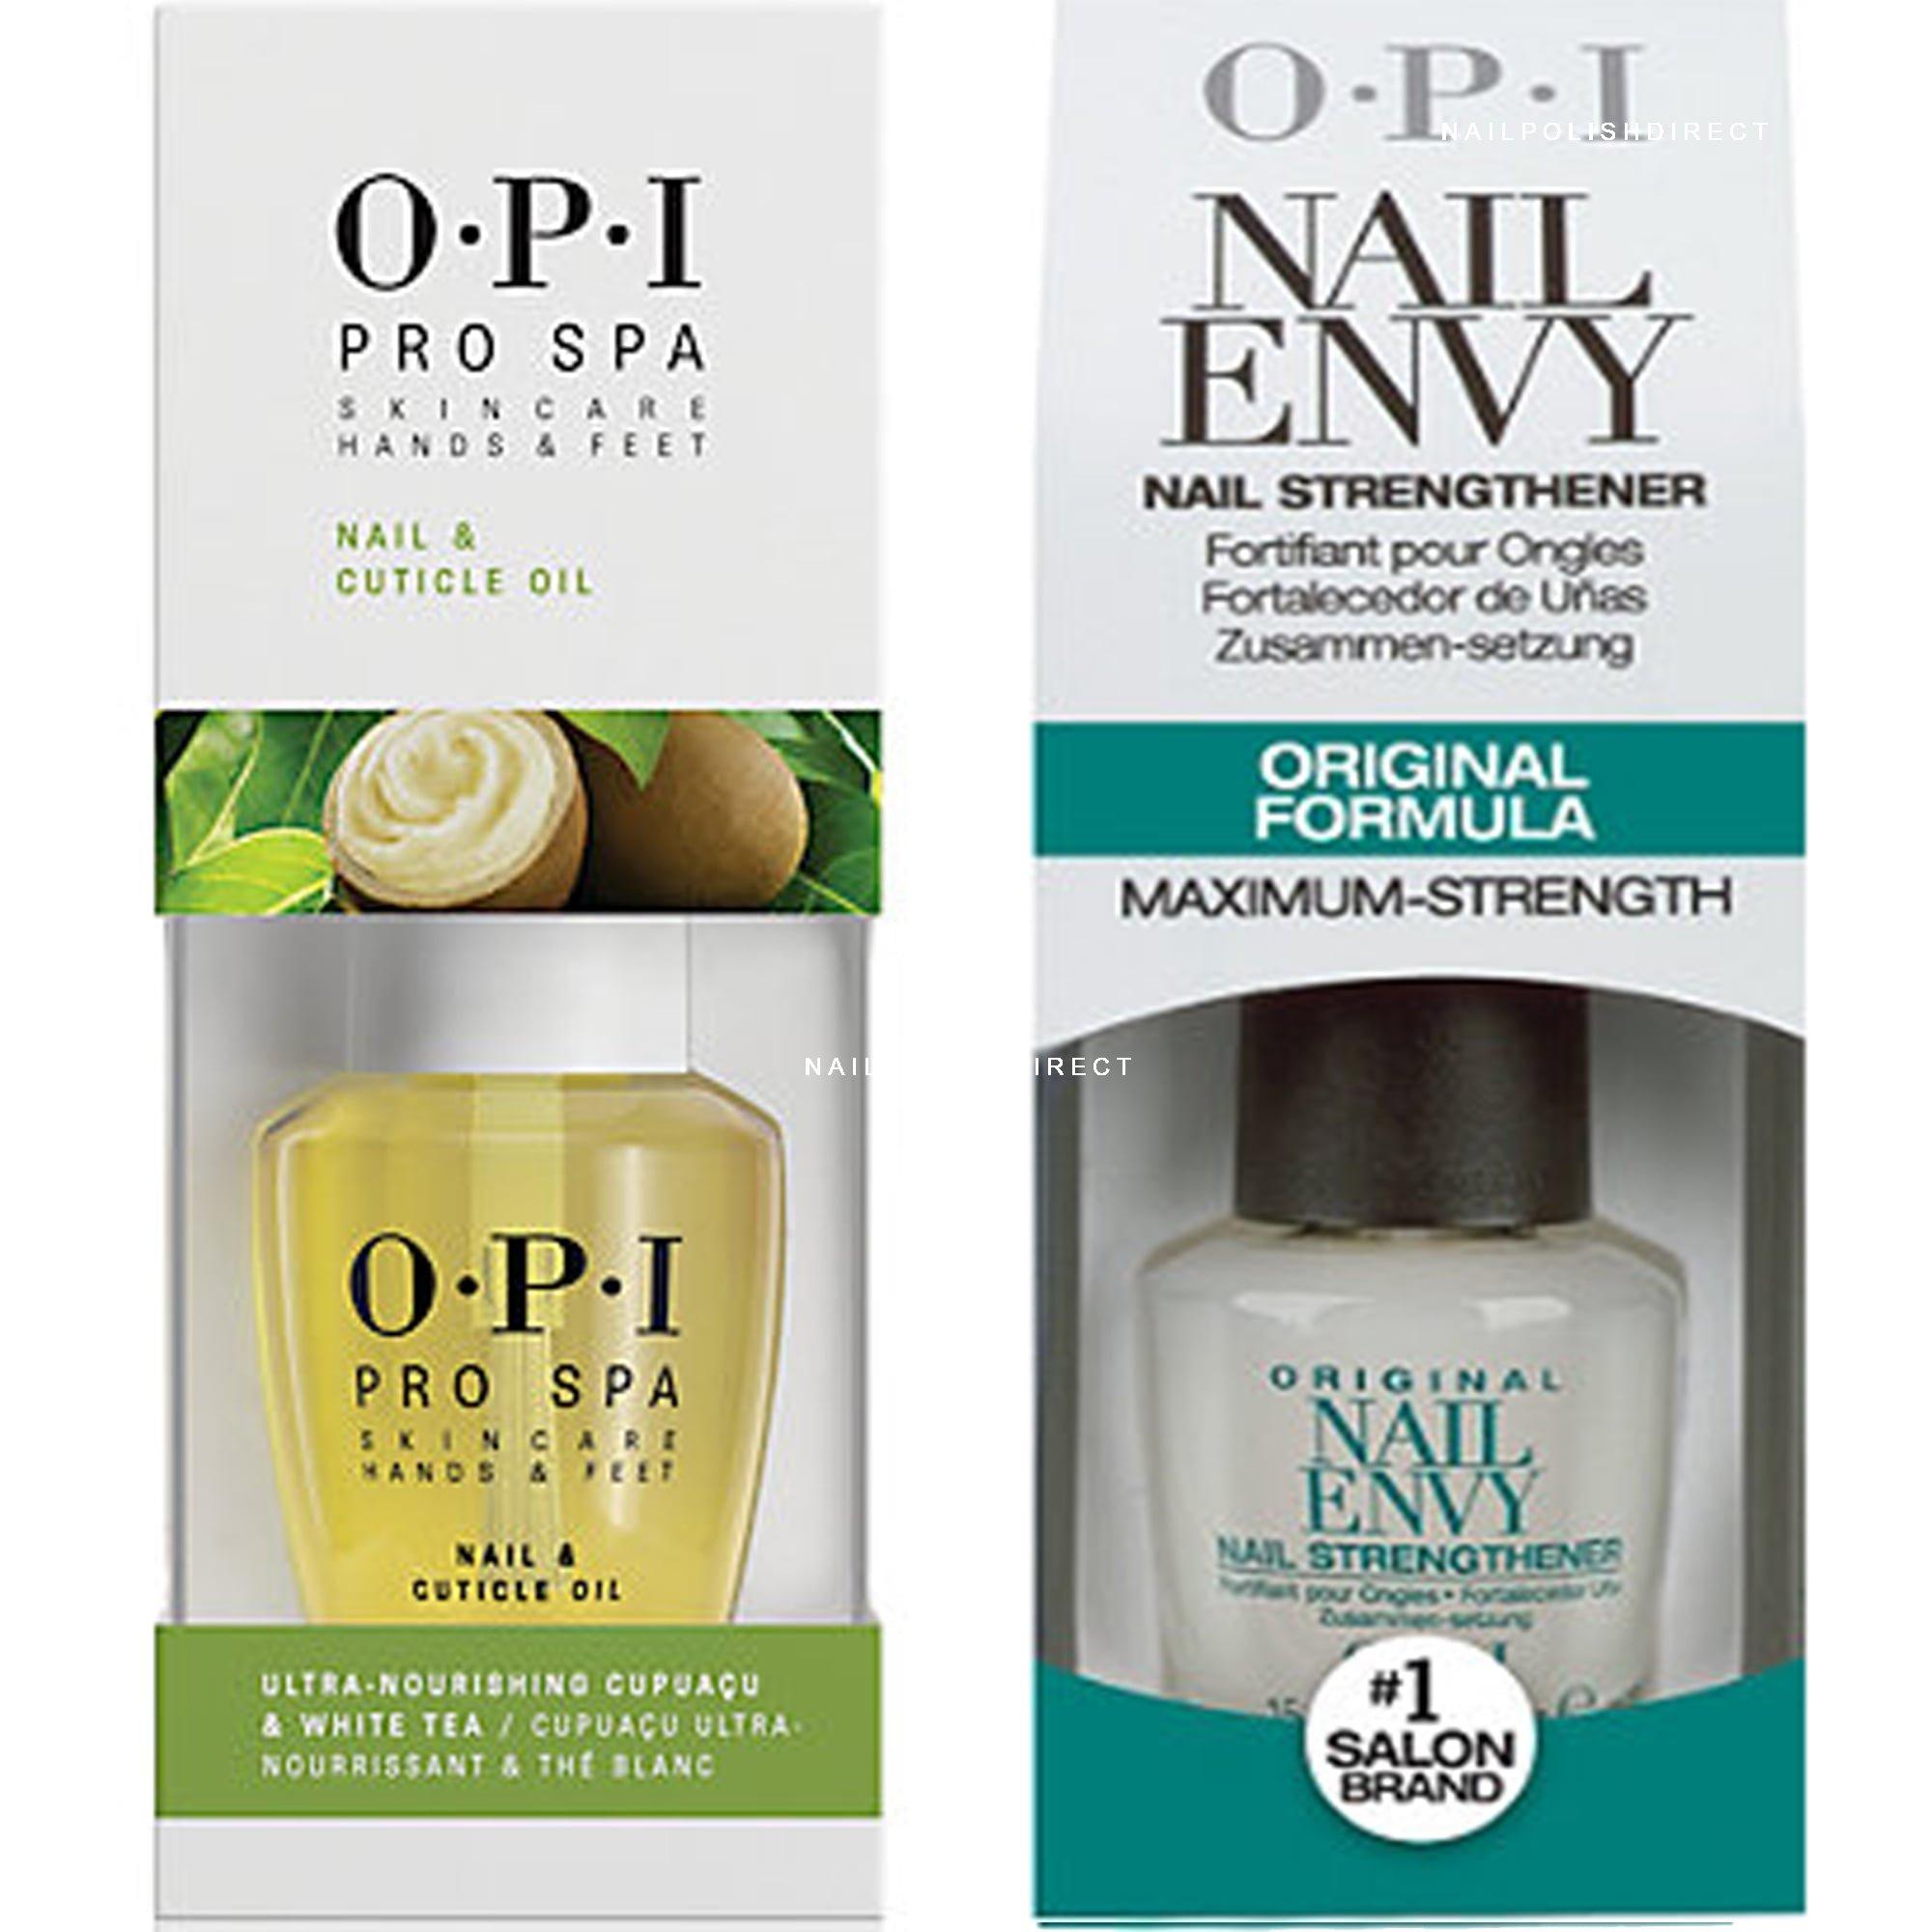 Nail Envy Legends Hours: OPI Nail Envy Original & Pro Spa Cuticle Oil Duo (1x 15ml